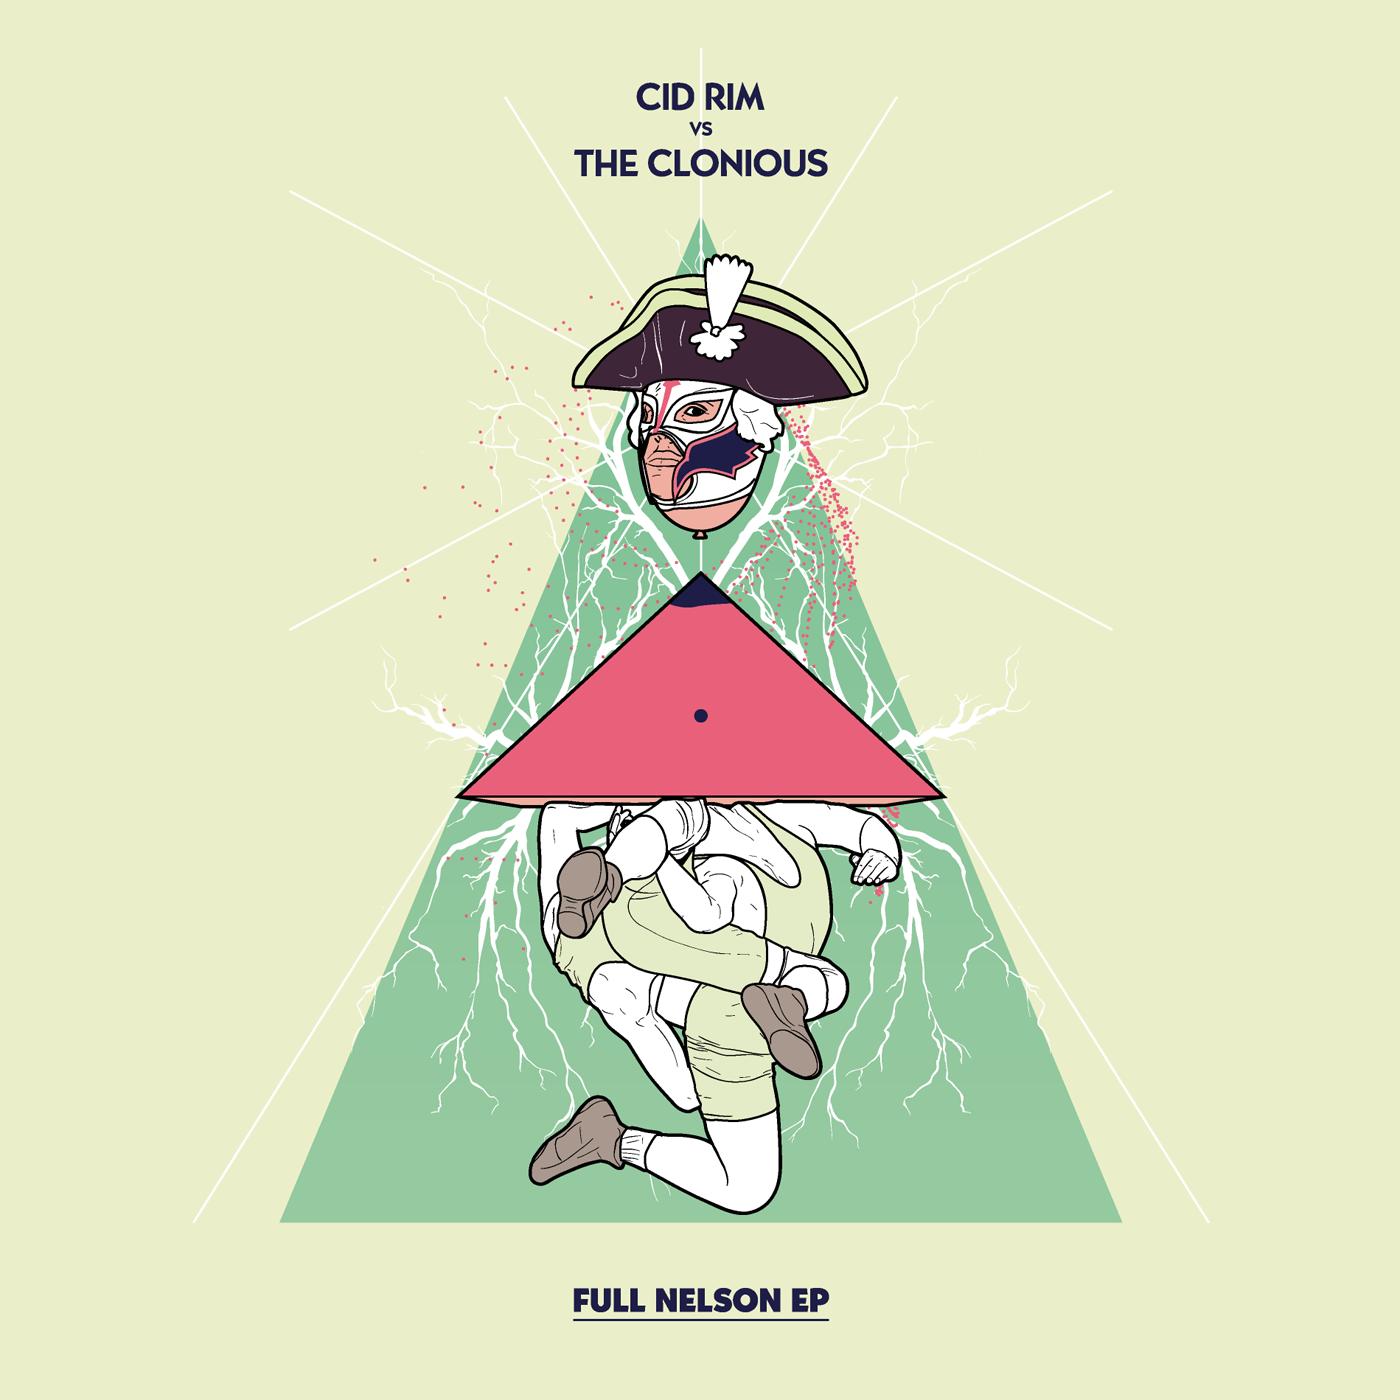 Cid Rim vs. The Clonious - Full Nelson